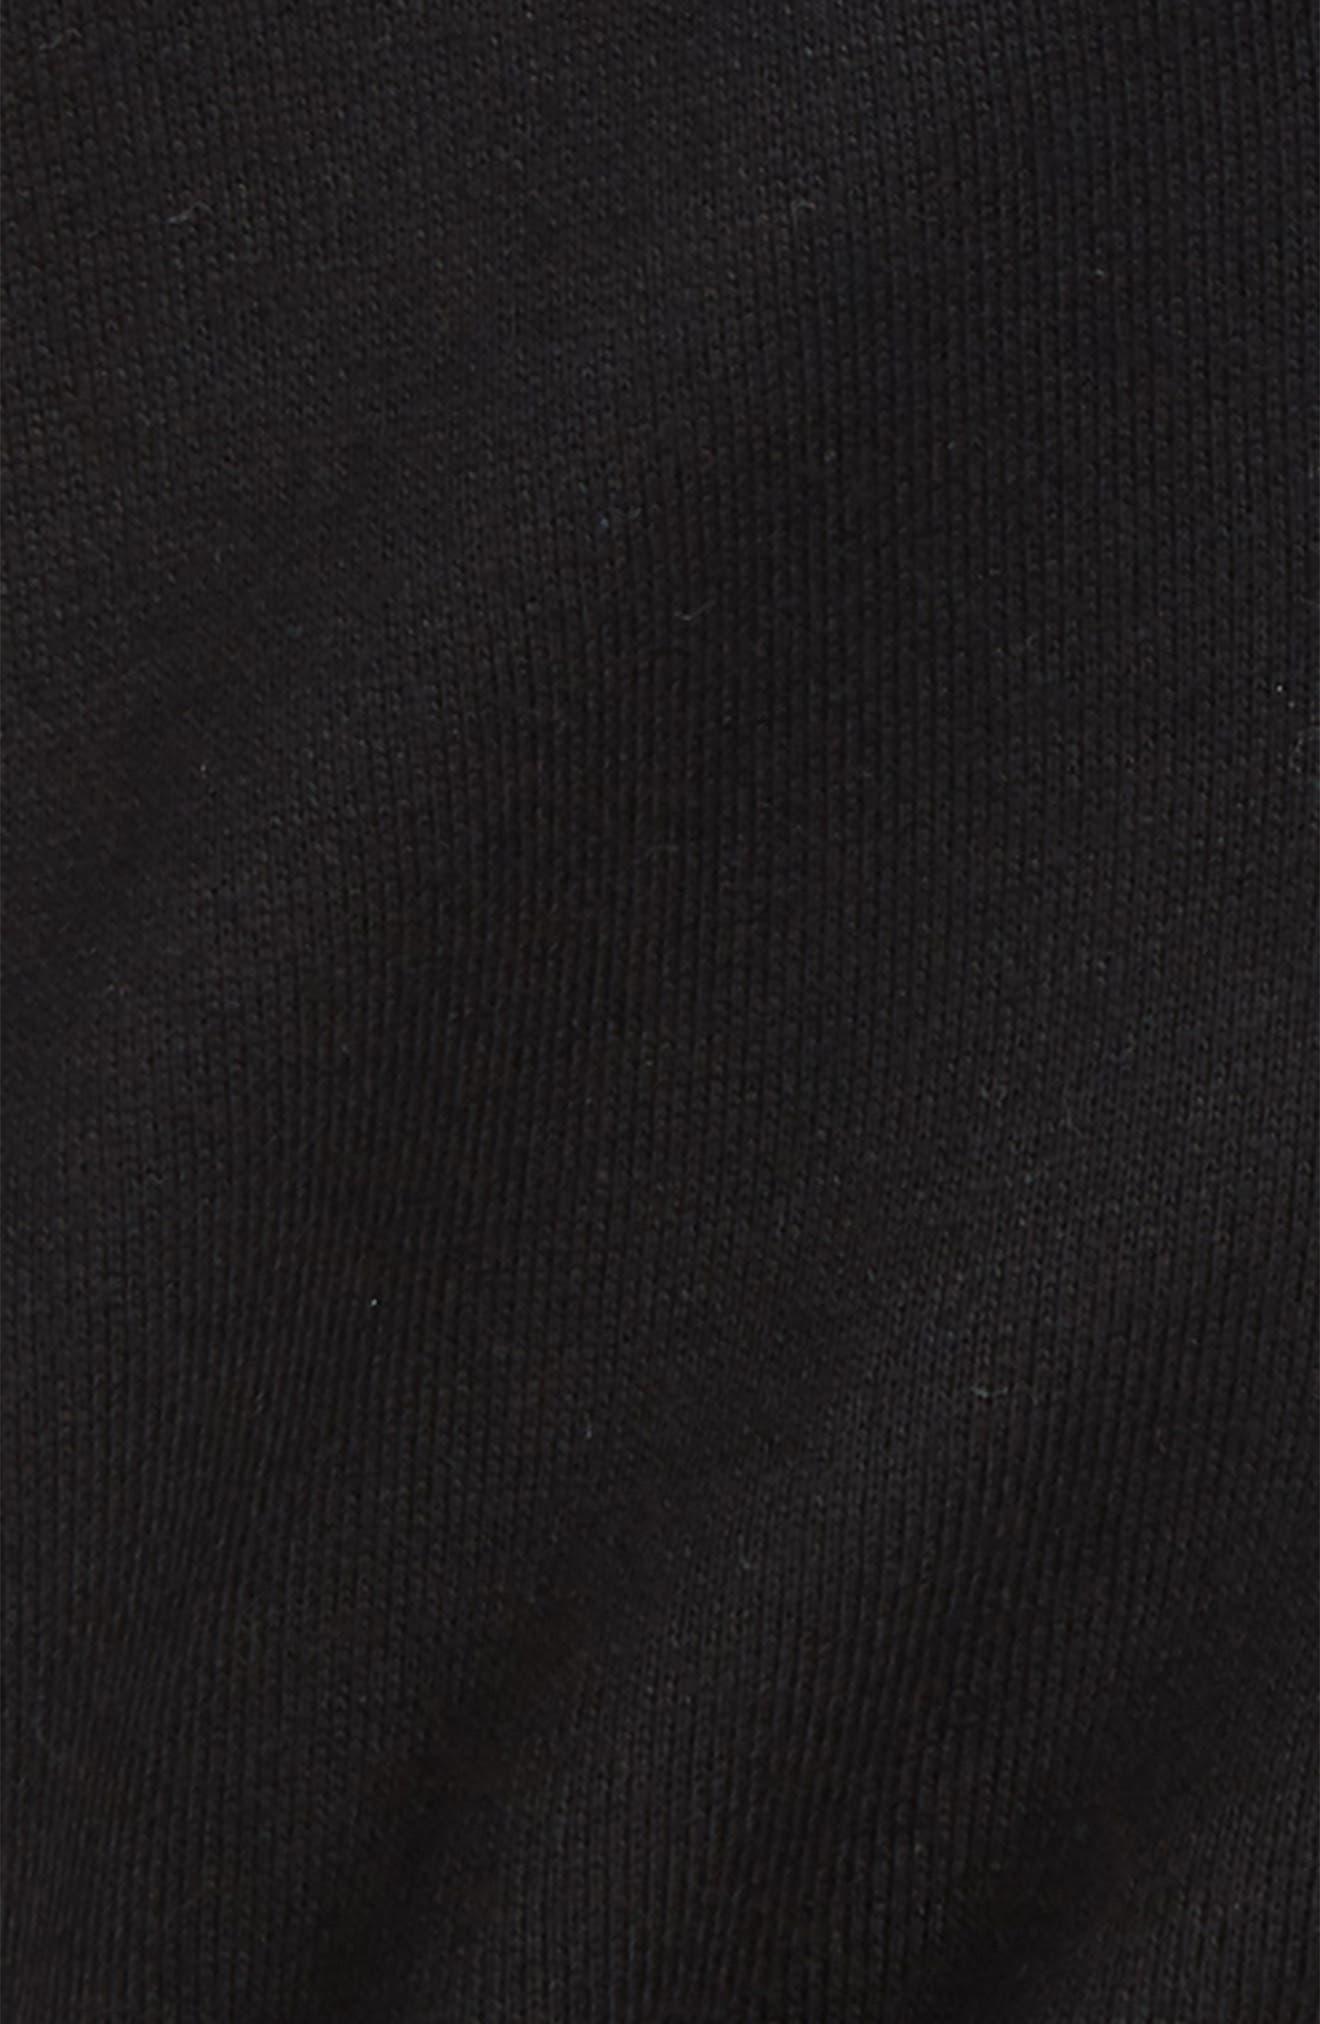 Knit Shorts,                             Alternate thumbnail 2, color,                             Black-Solid